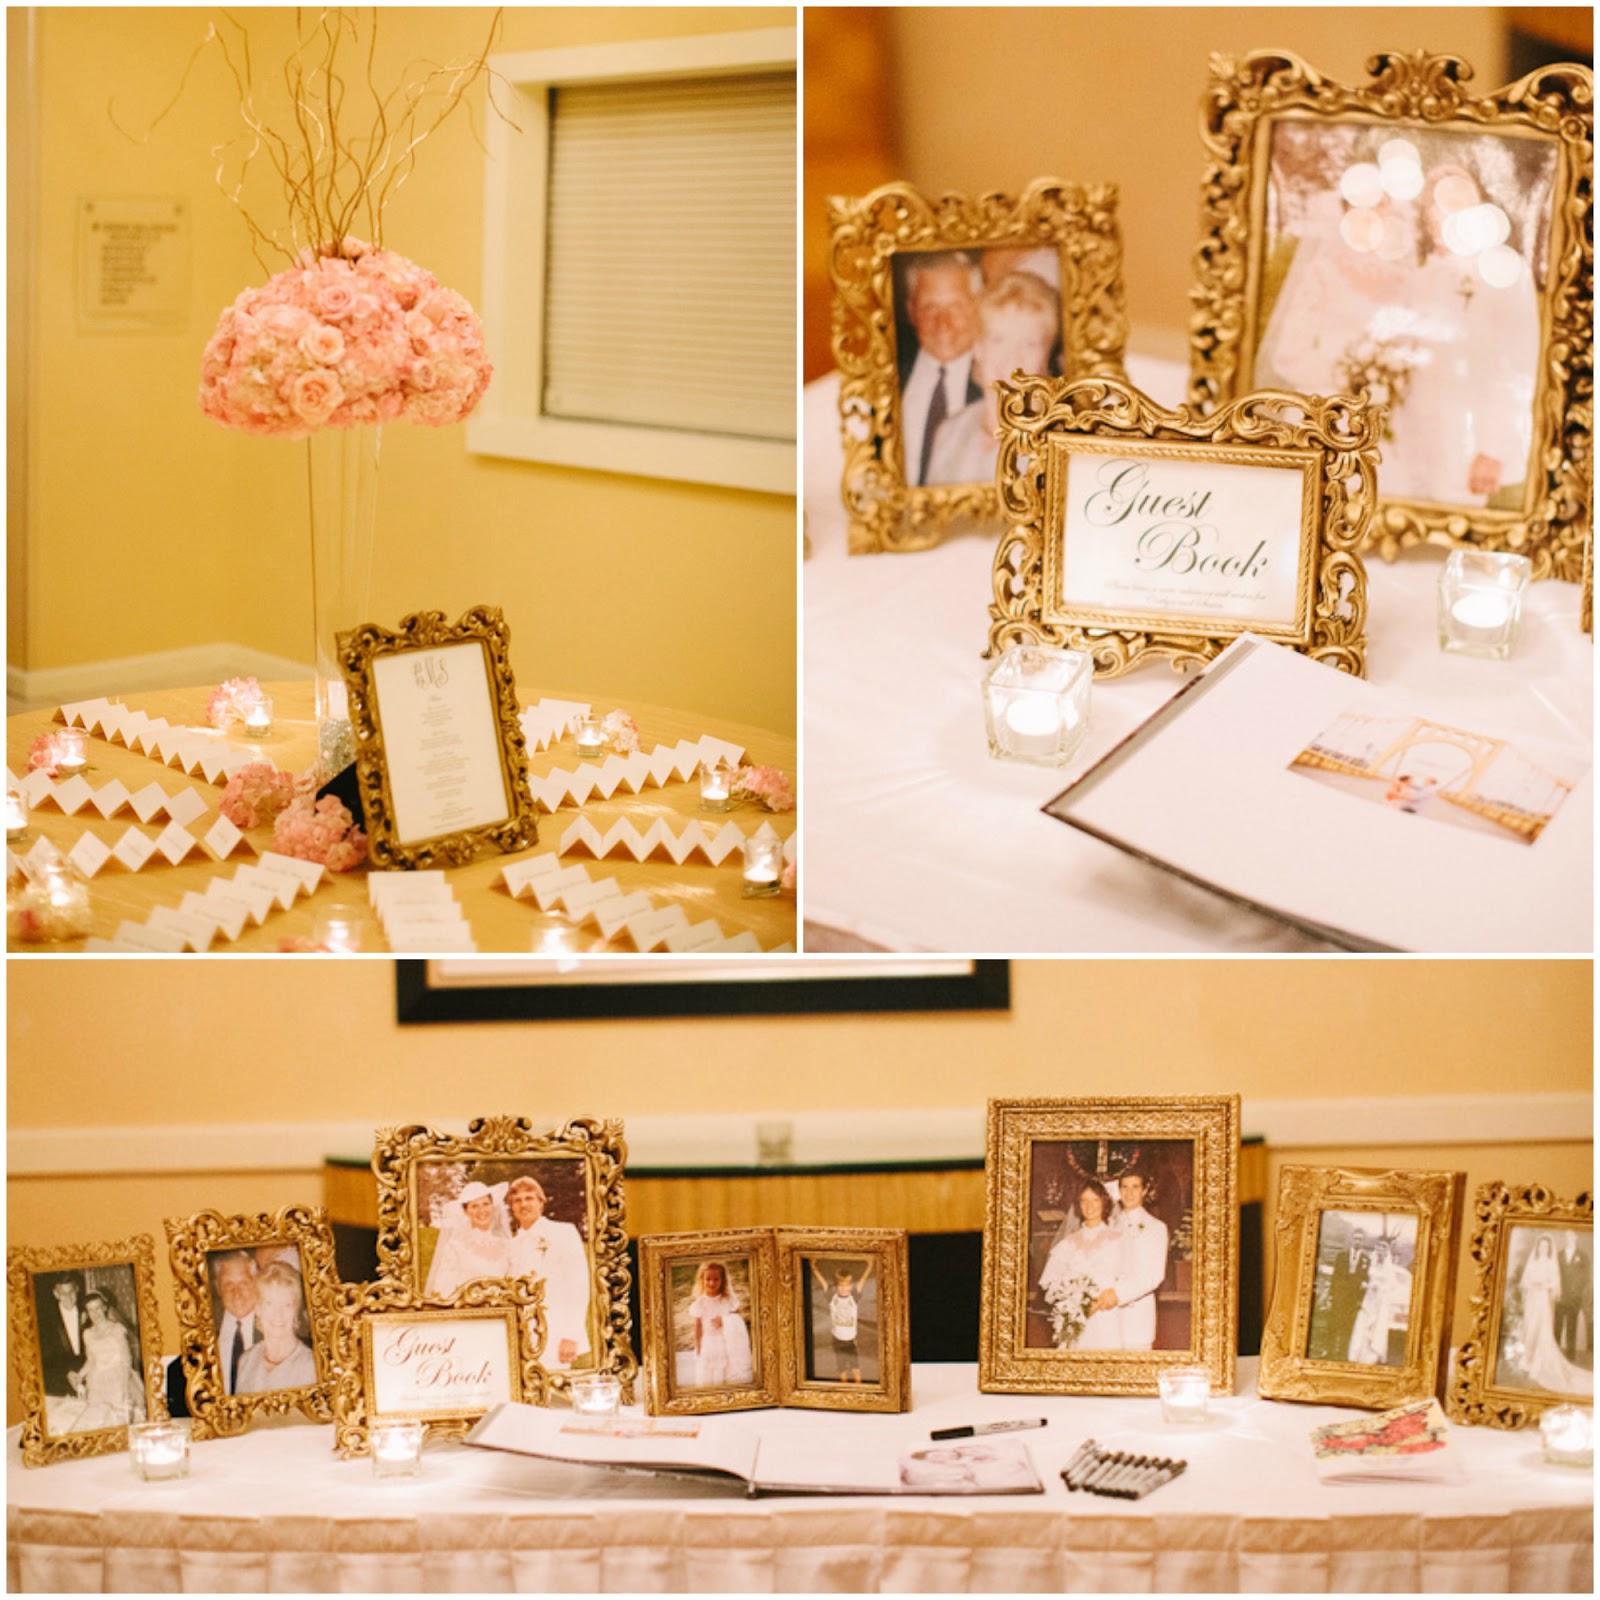 Small Wedding Reception Ideas At Home: Wedding: Reception